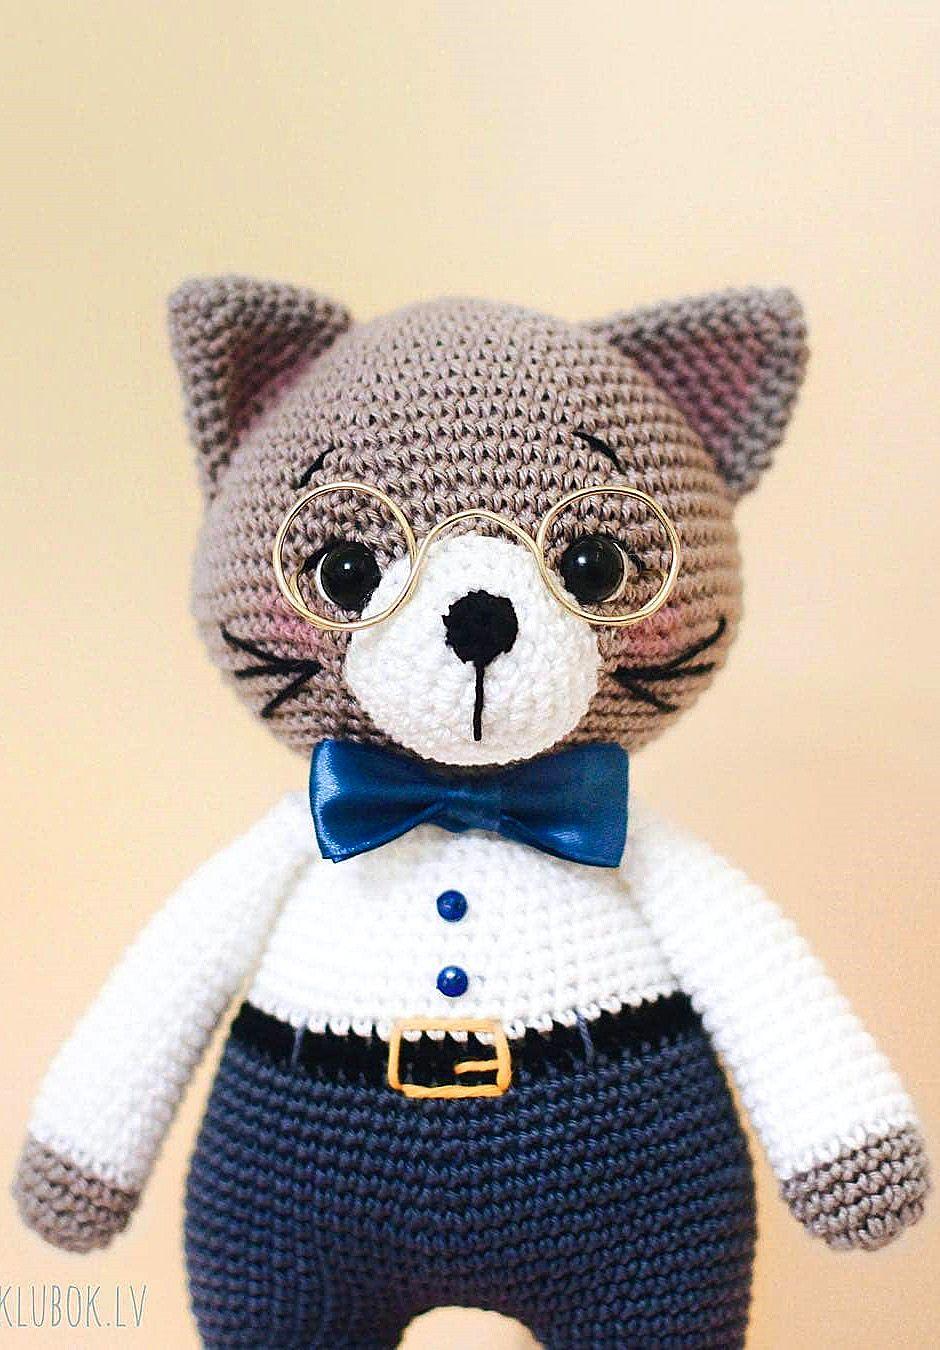 Free Safari Animal Amigurumi Patterns | Crochet toys patterns ... | 1350x940